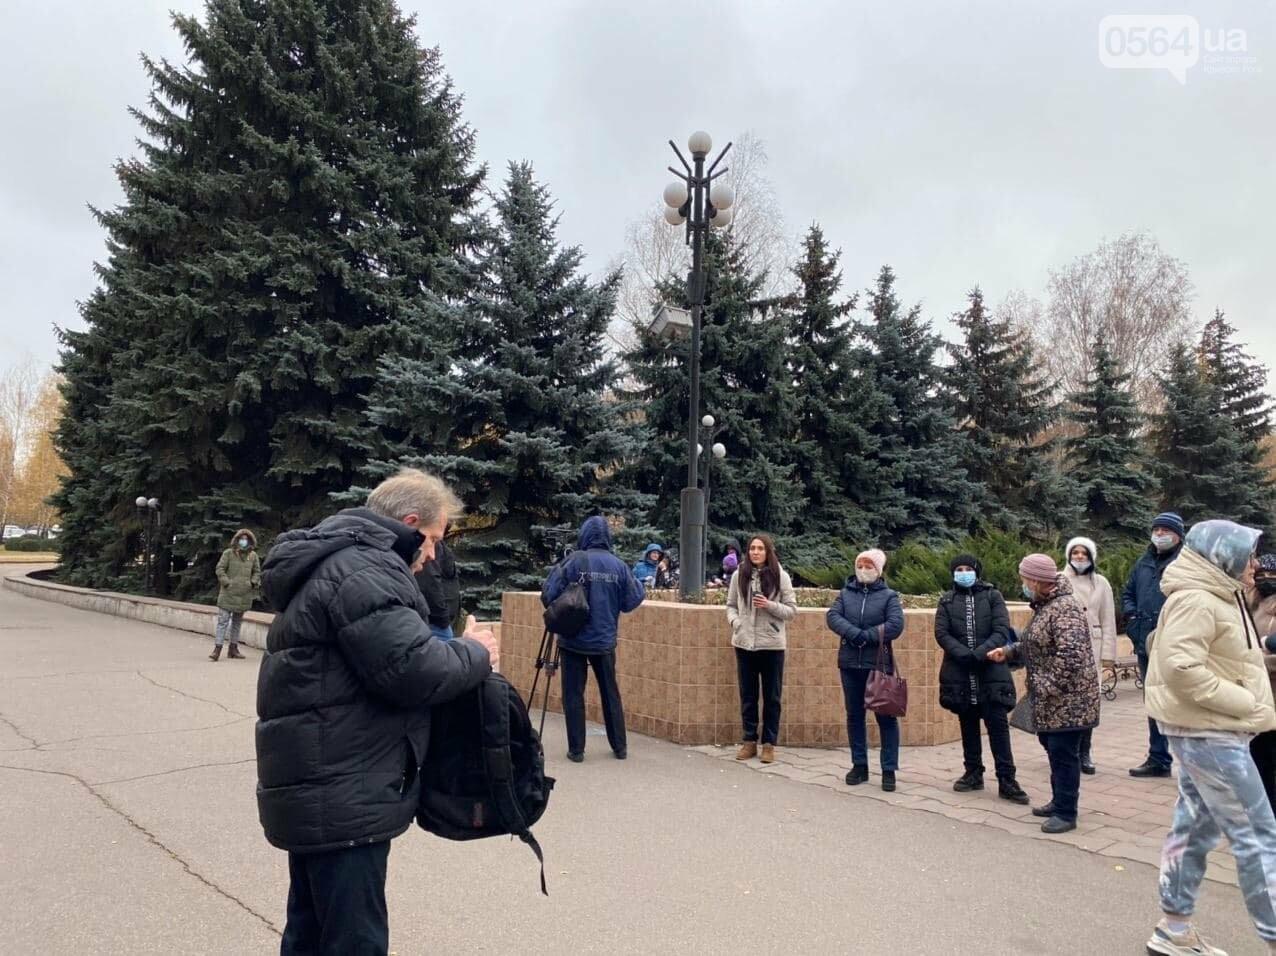 Представители малого бизнеса продолжили протест возле мэрии Кривого Рога, - ФОТО, ВИДЕО, фото-12